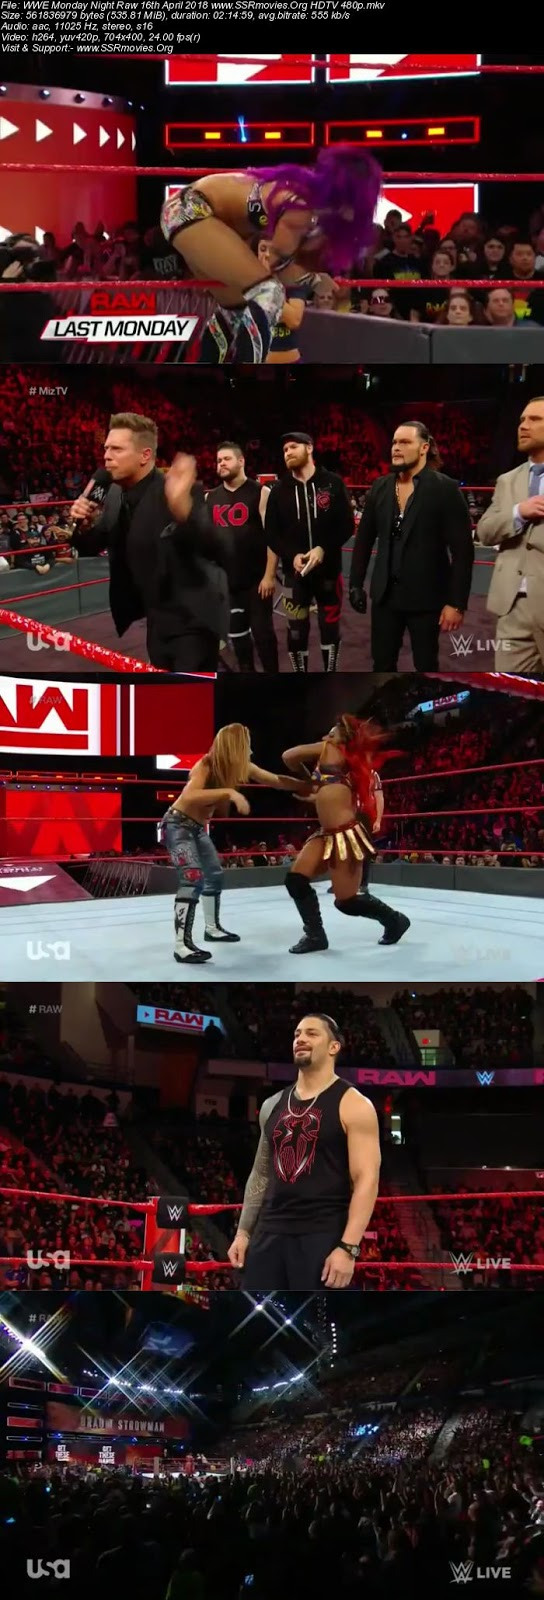 WWE Monday Night Raw 16th April 2018 HDTV 480p